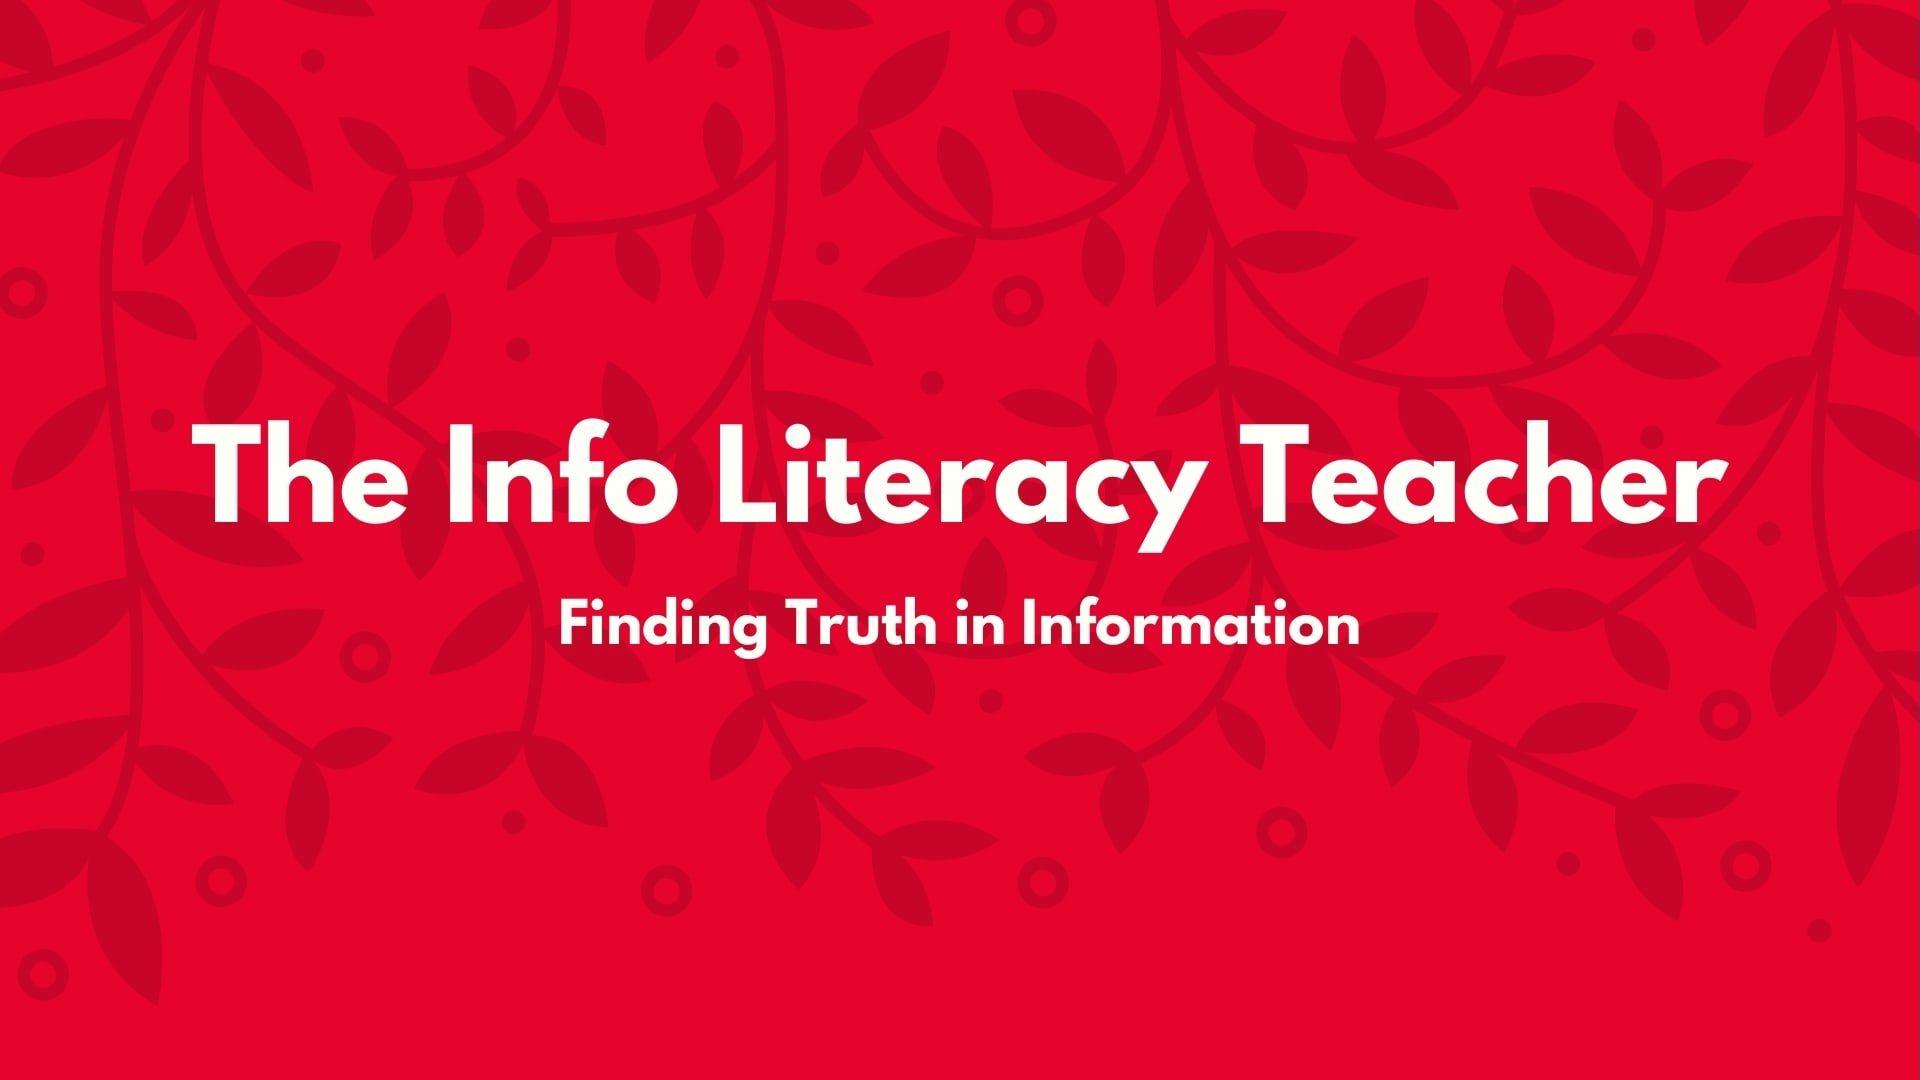 The Info Literacy Teacher